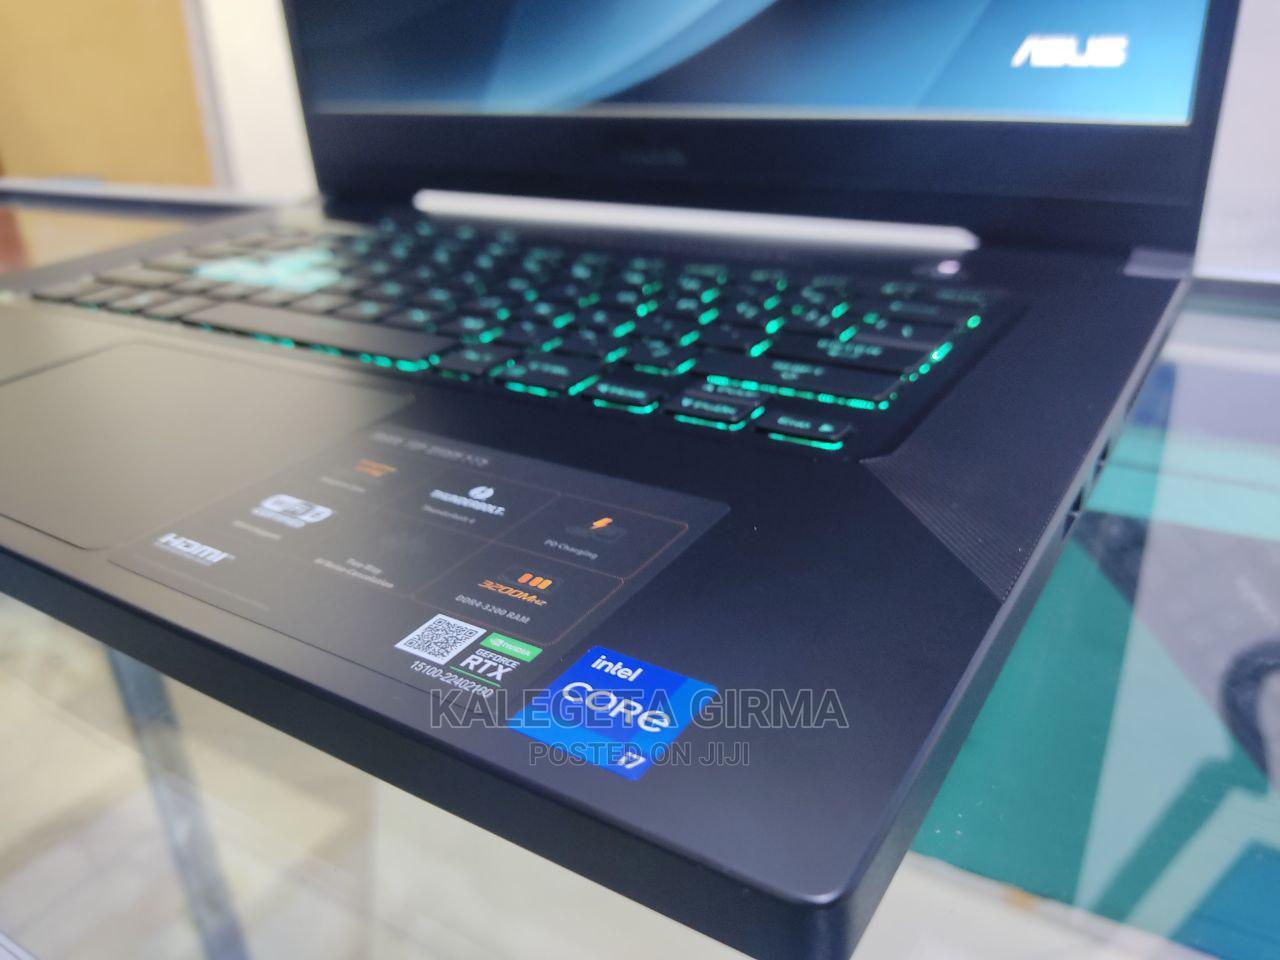 New Laptop Asus TUF Gaming FX504 16GB Intel Core I7 SSD 512GB